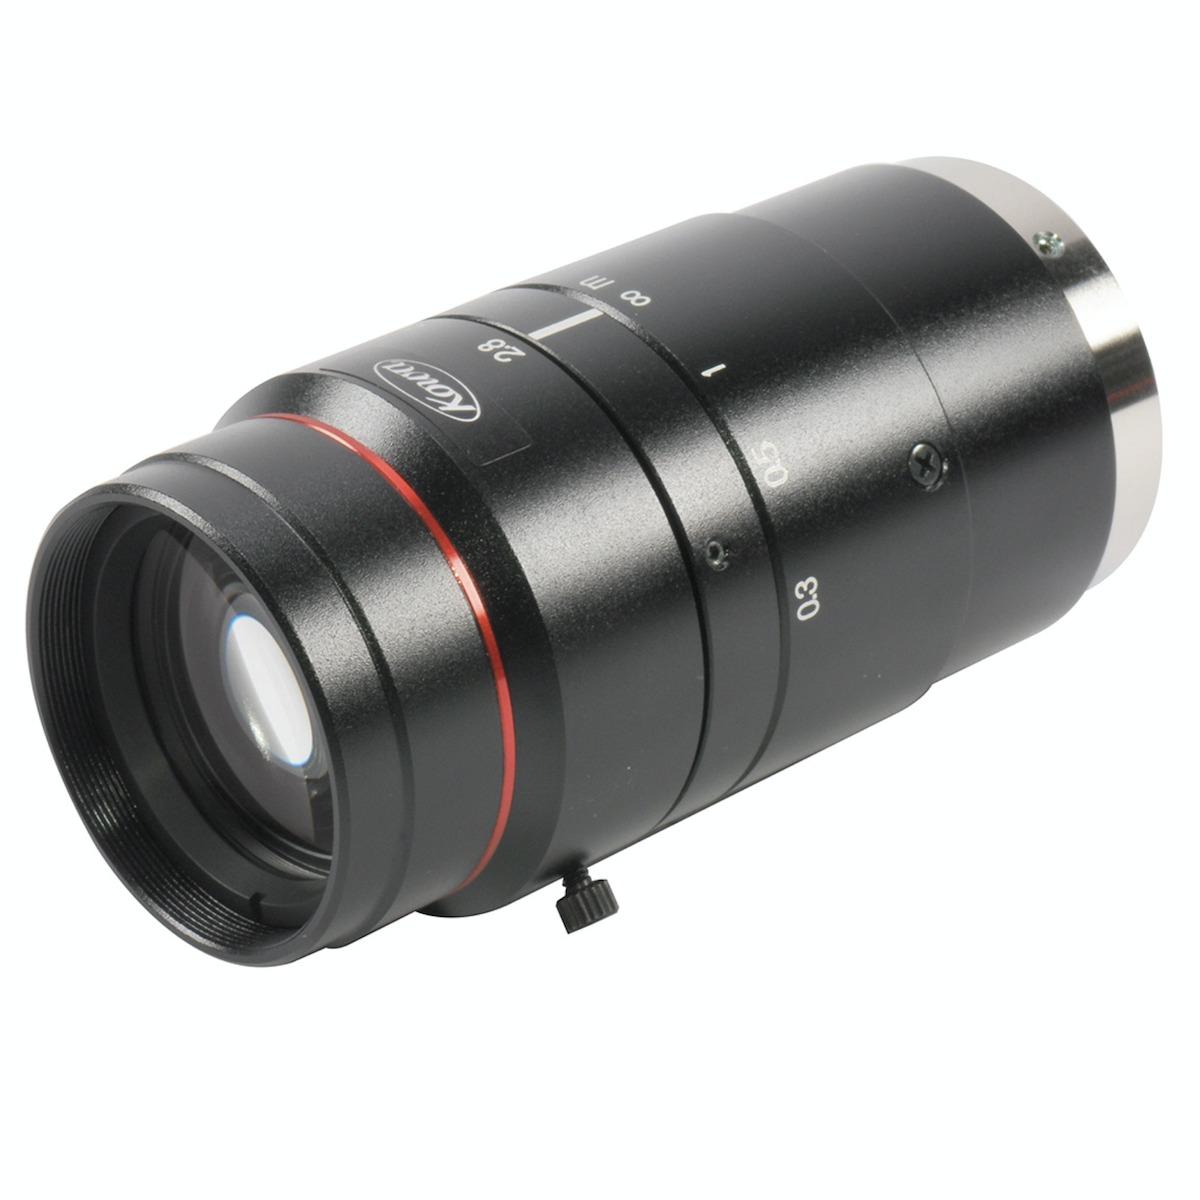 Kowa LM50JC10M lens 3/4 view